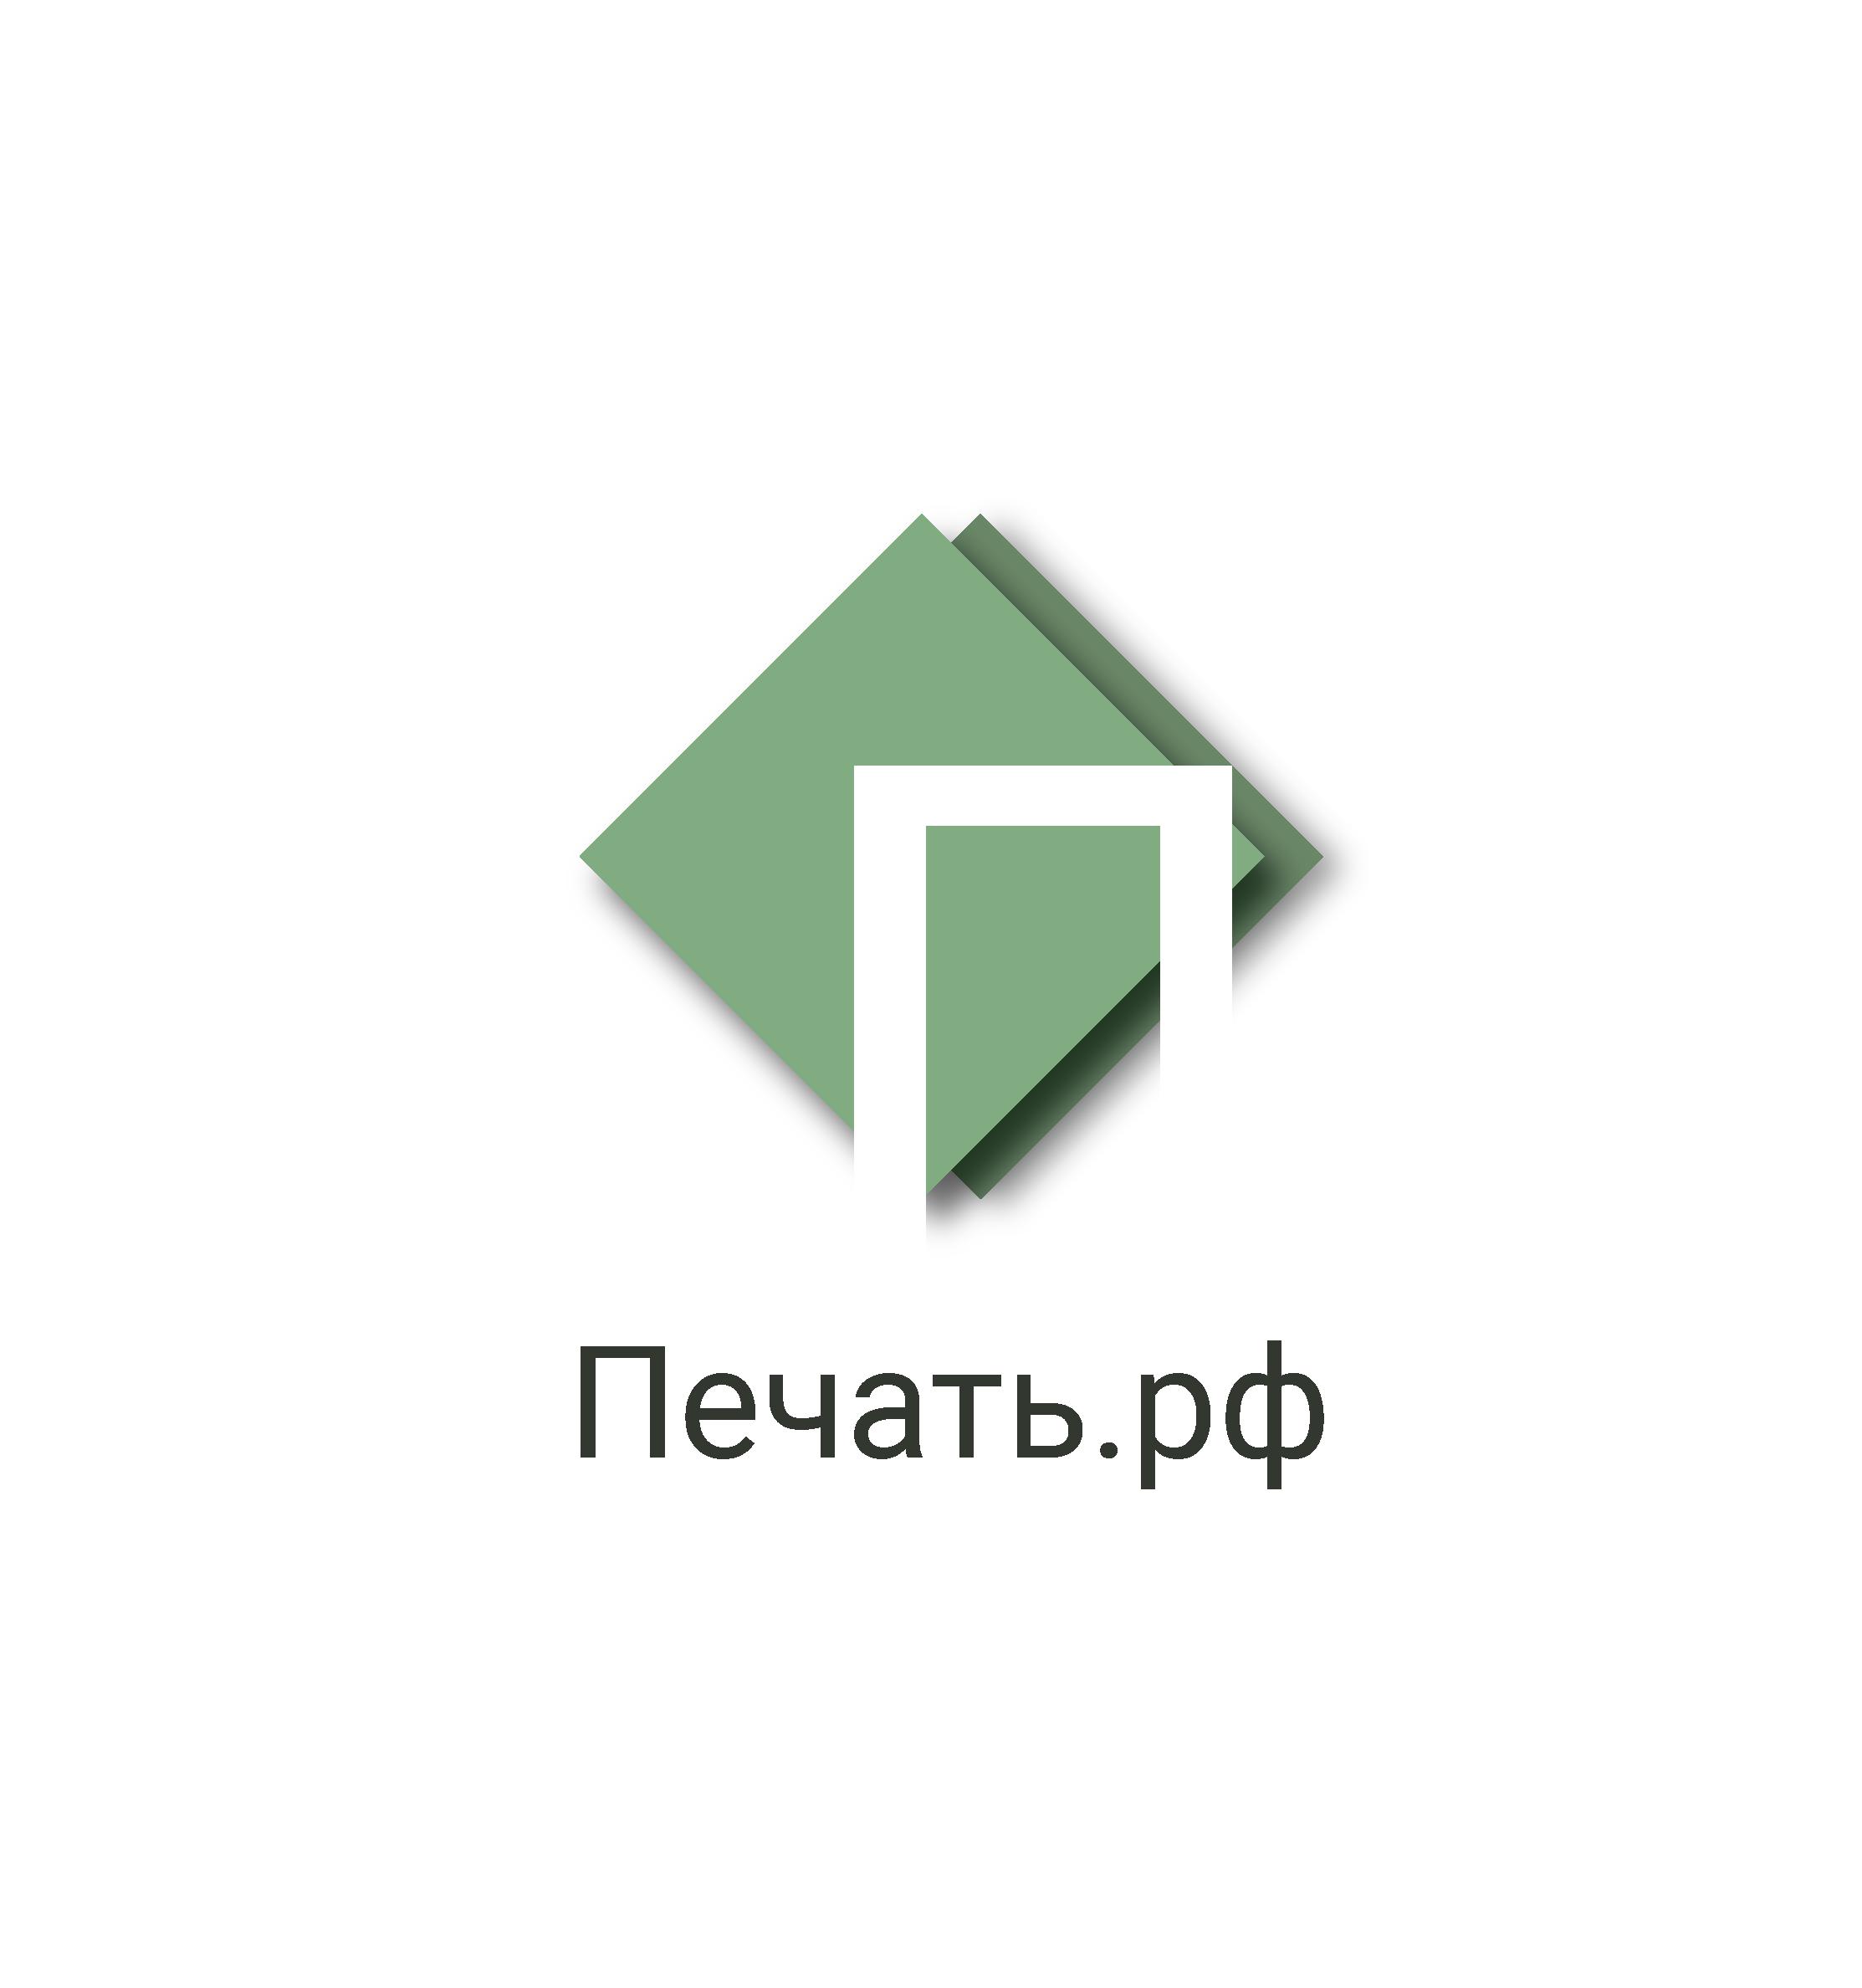 Логотип для веб-сервиса интерьерной печати и оперативной пол фото f_8505d28fe23e7dac.png